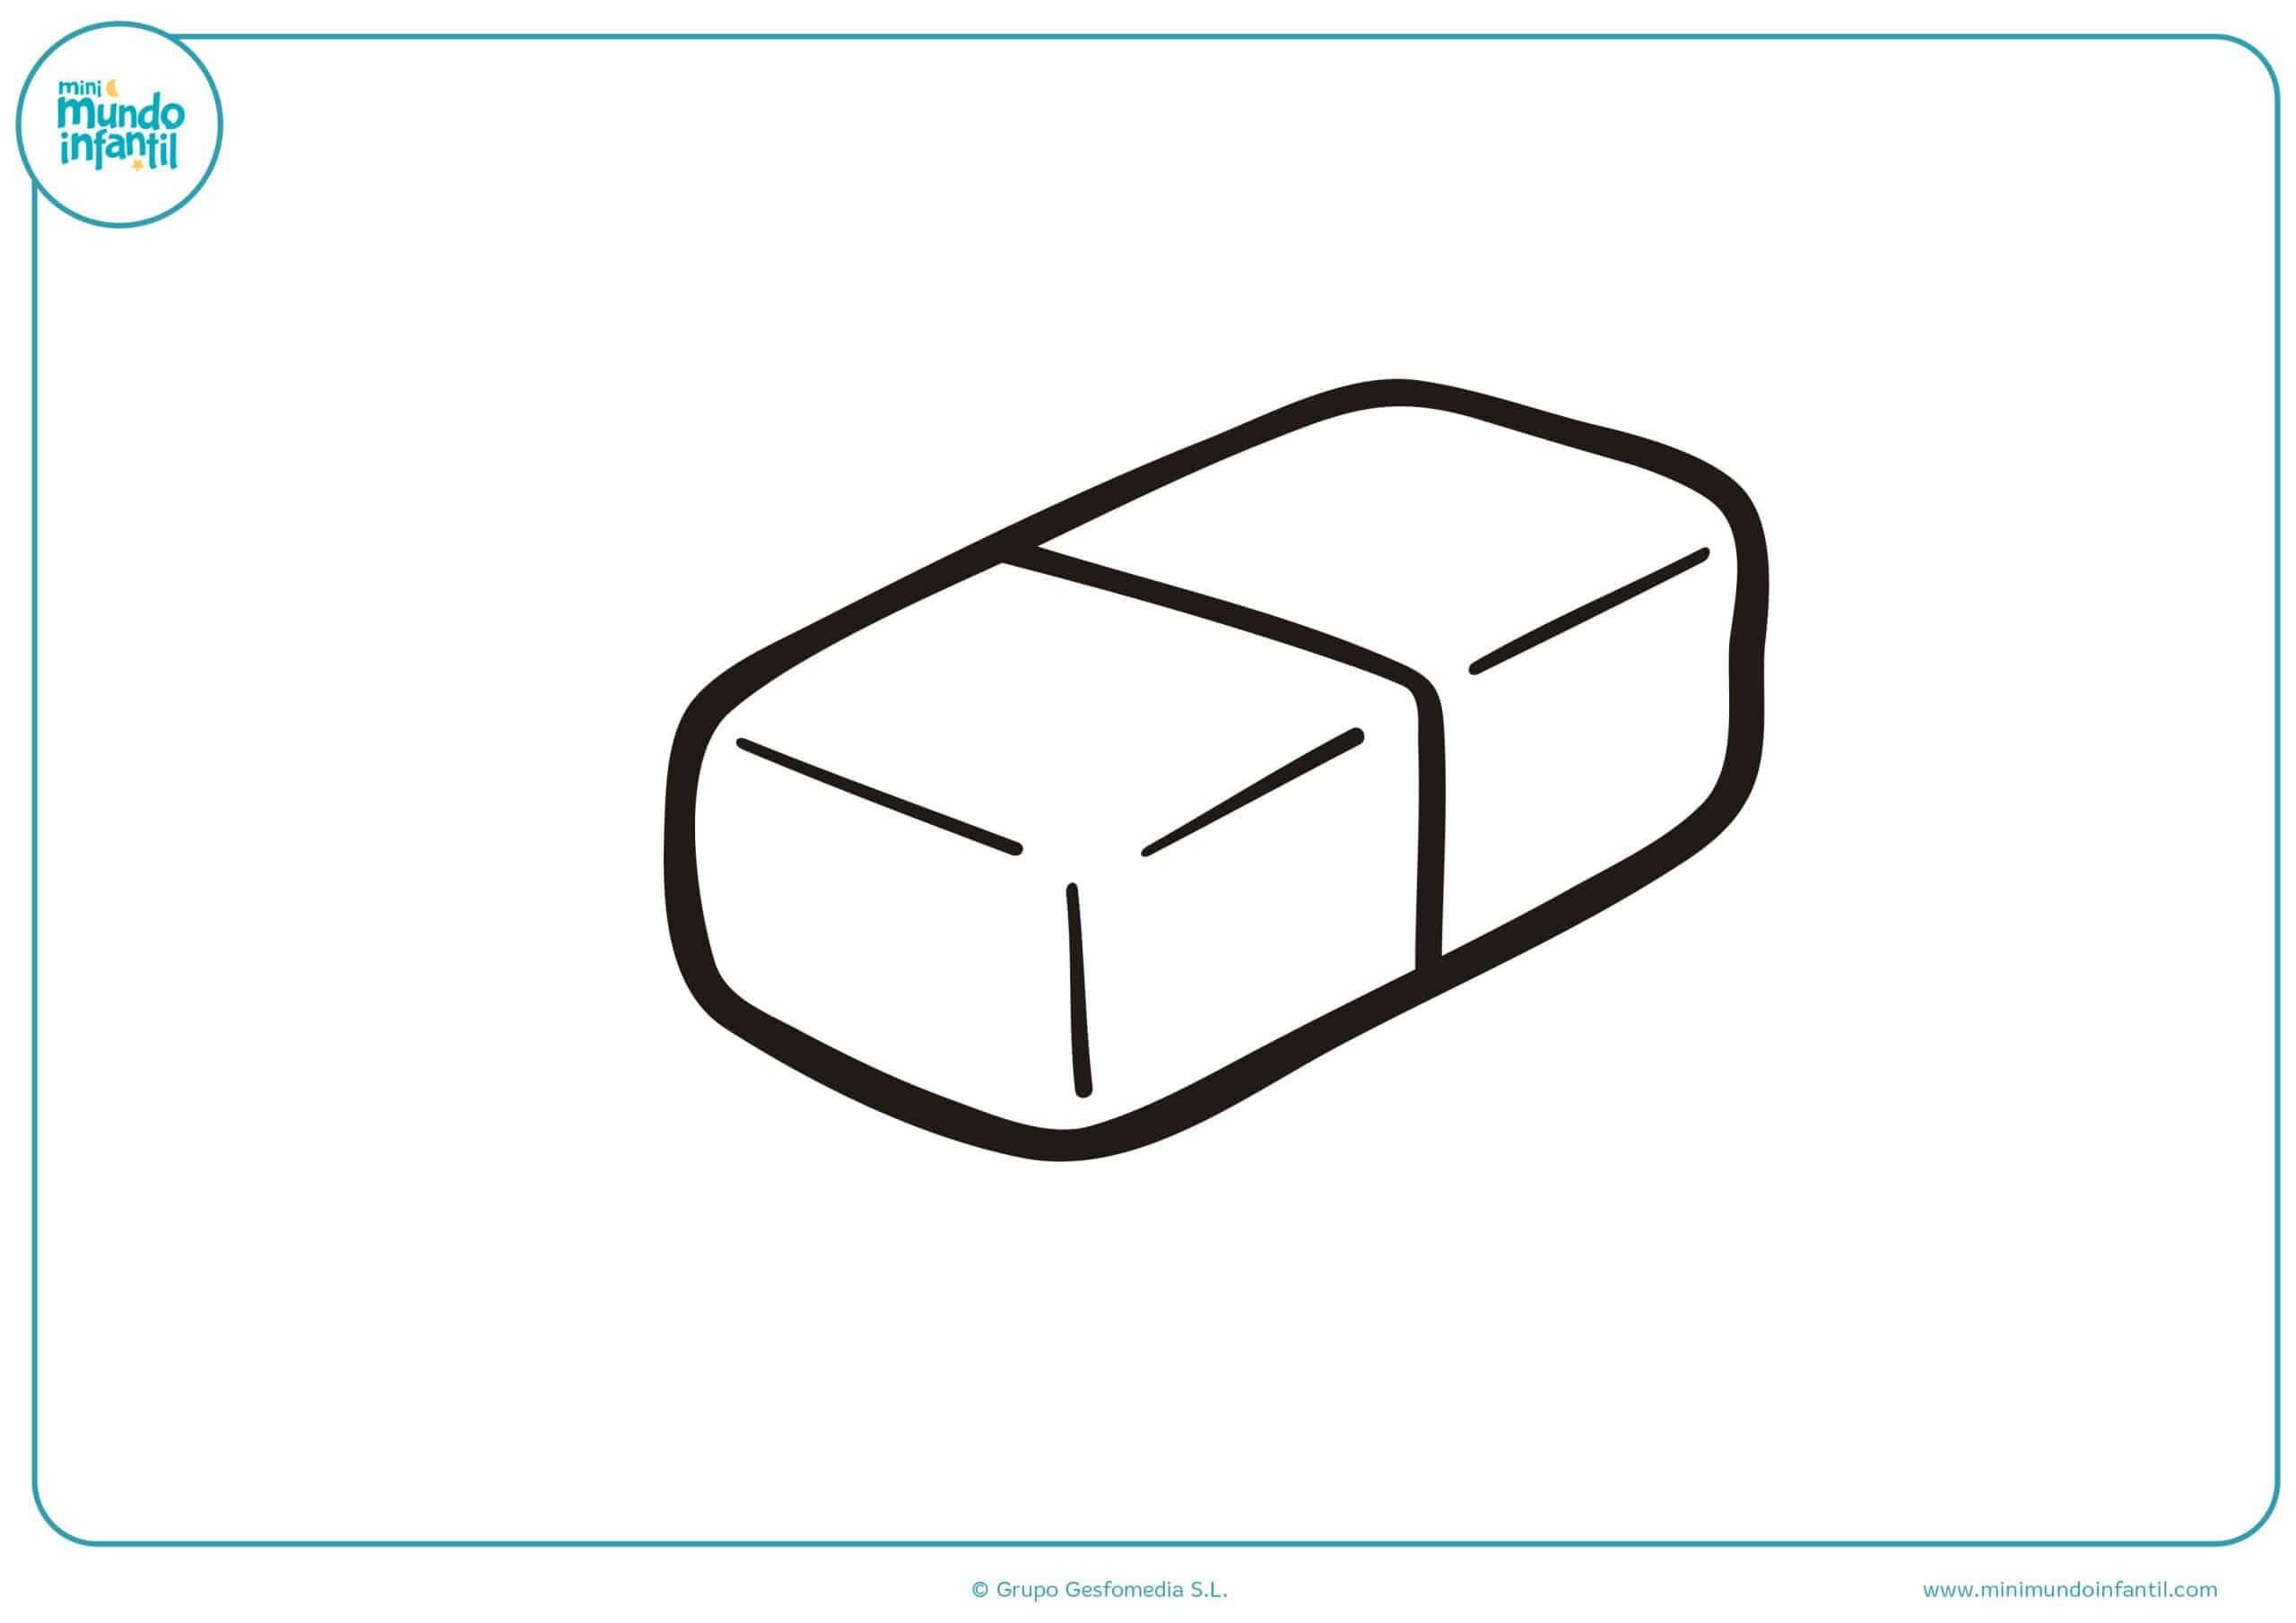 Dibujos de material escolar para dibujar